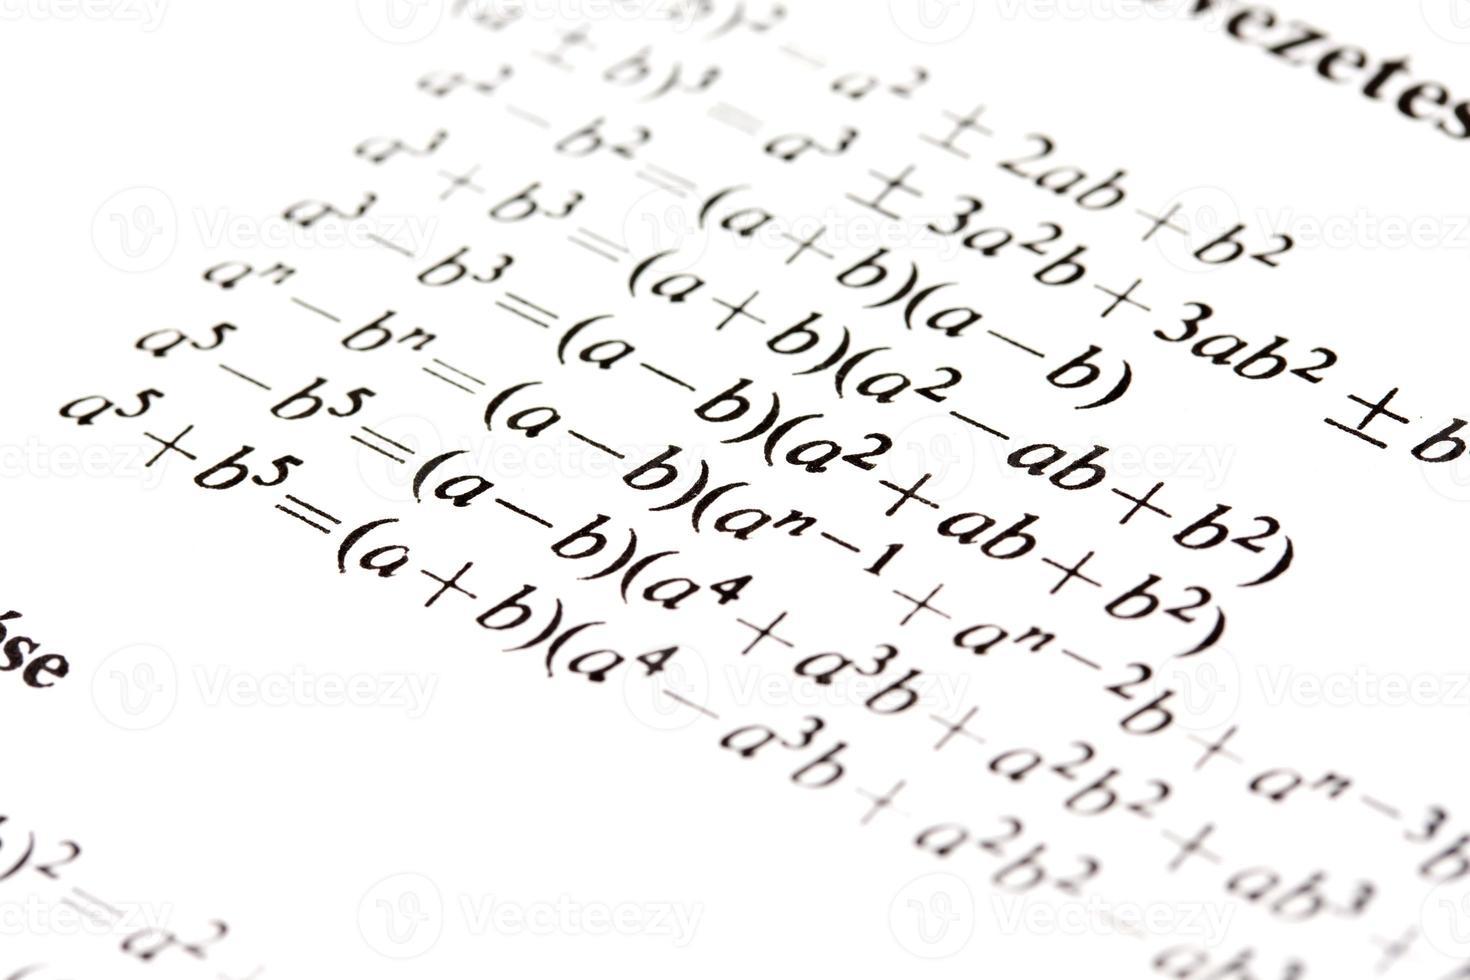 fórmulas de álgebra foto